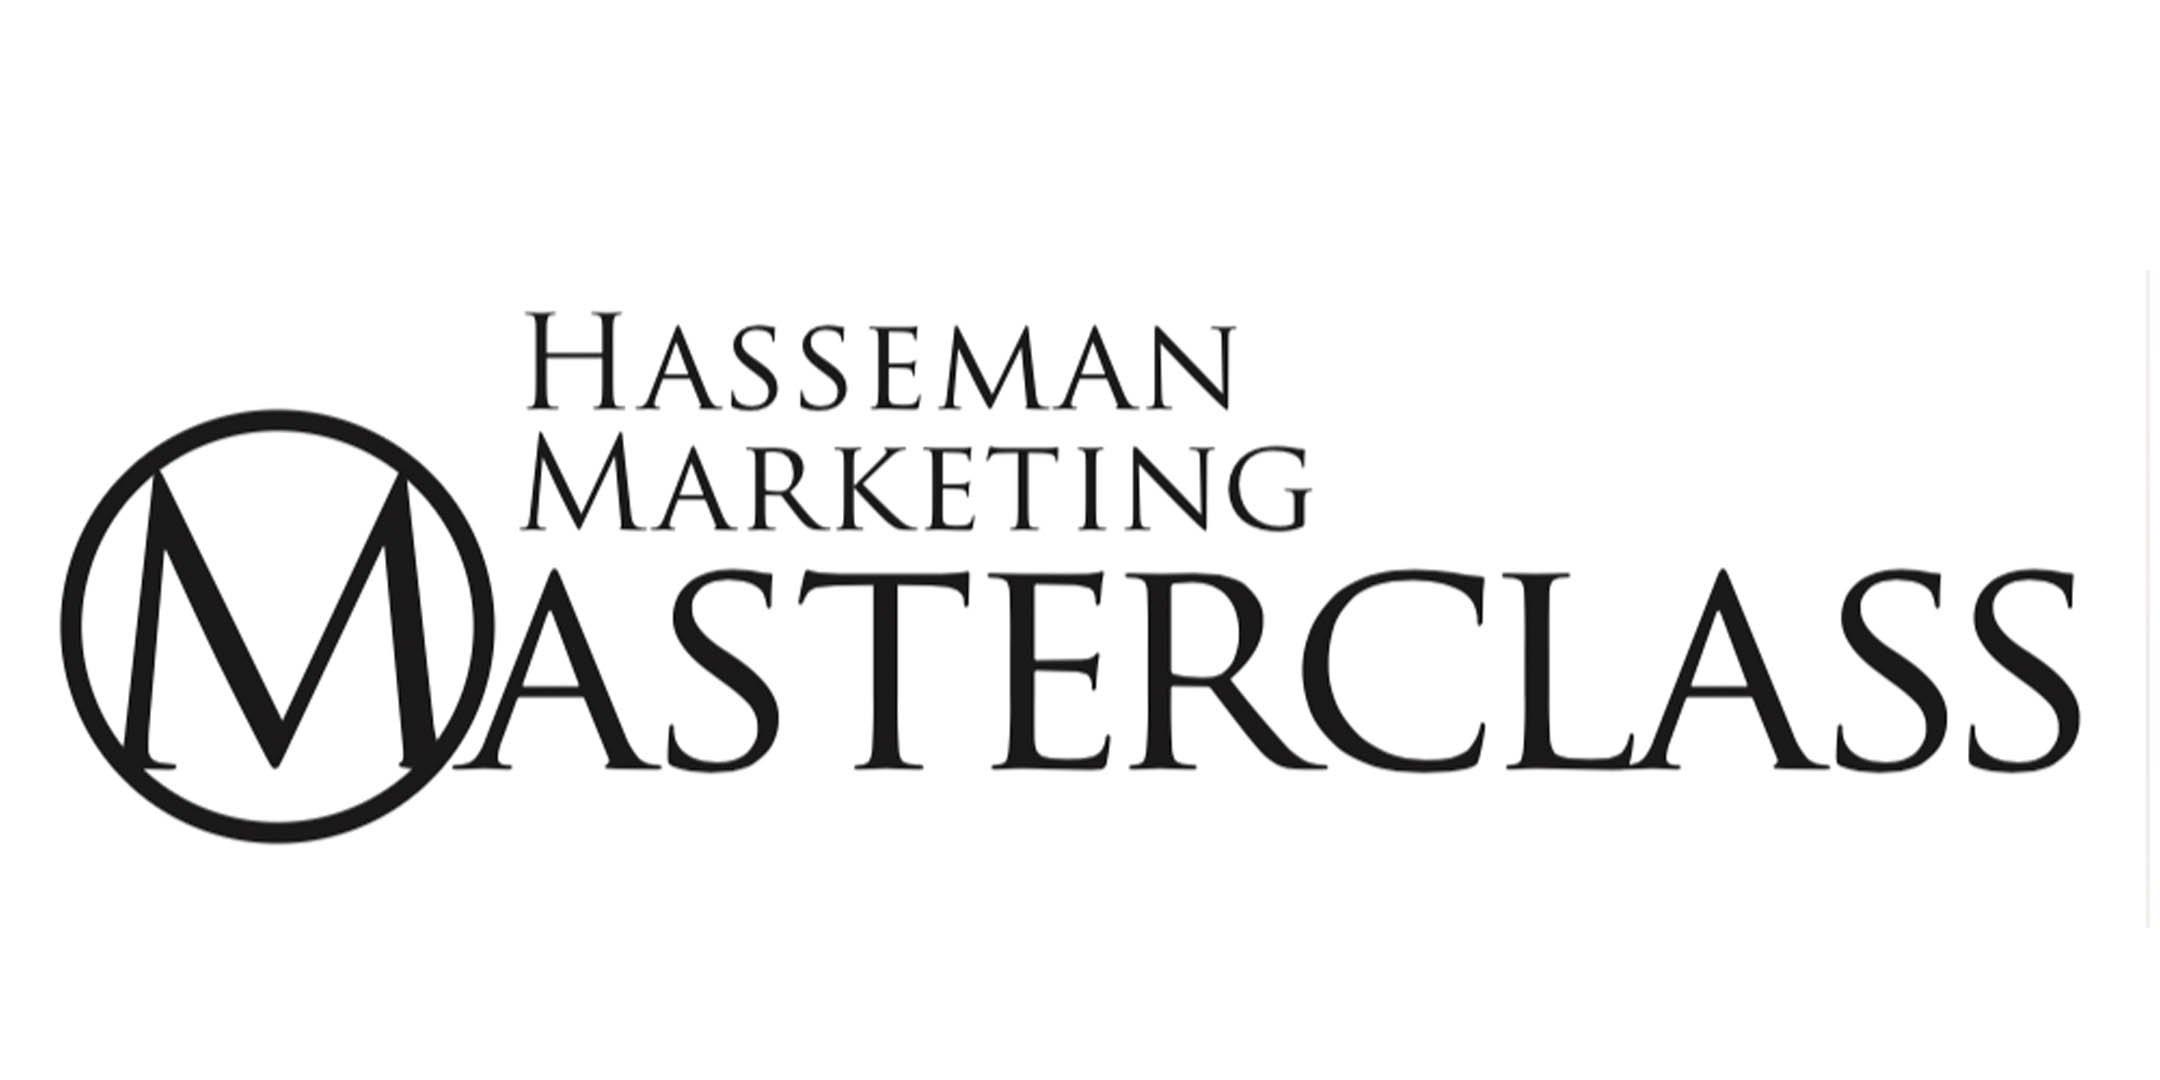 hasseman marketing masterclass